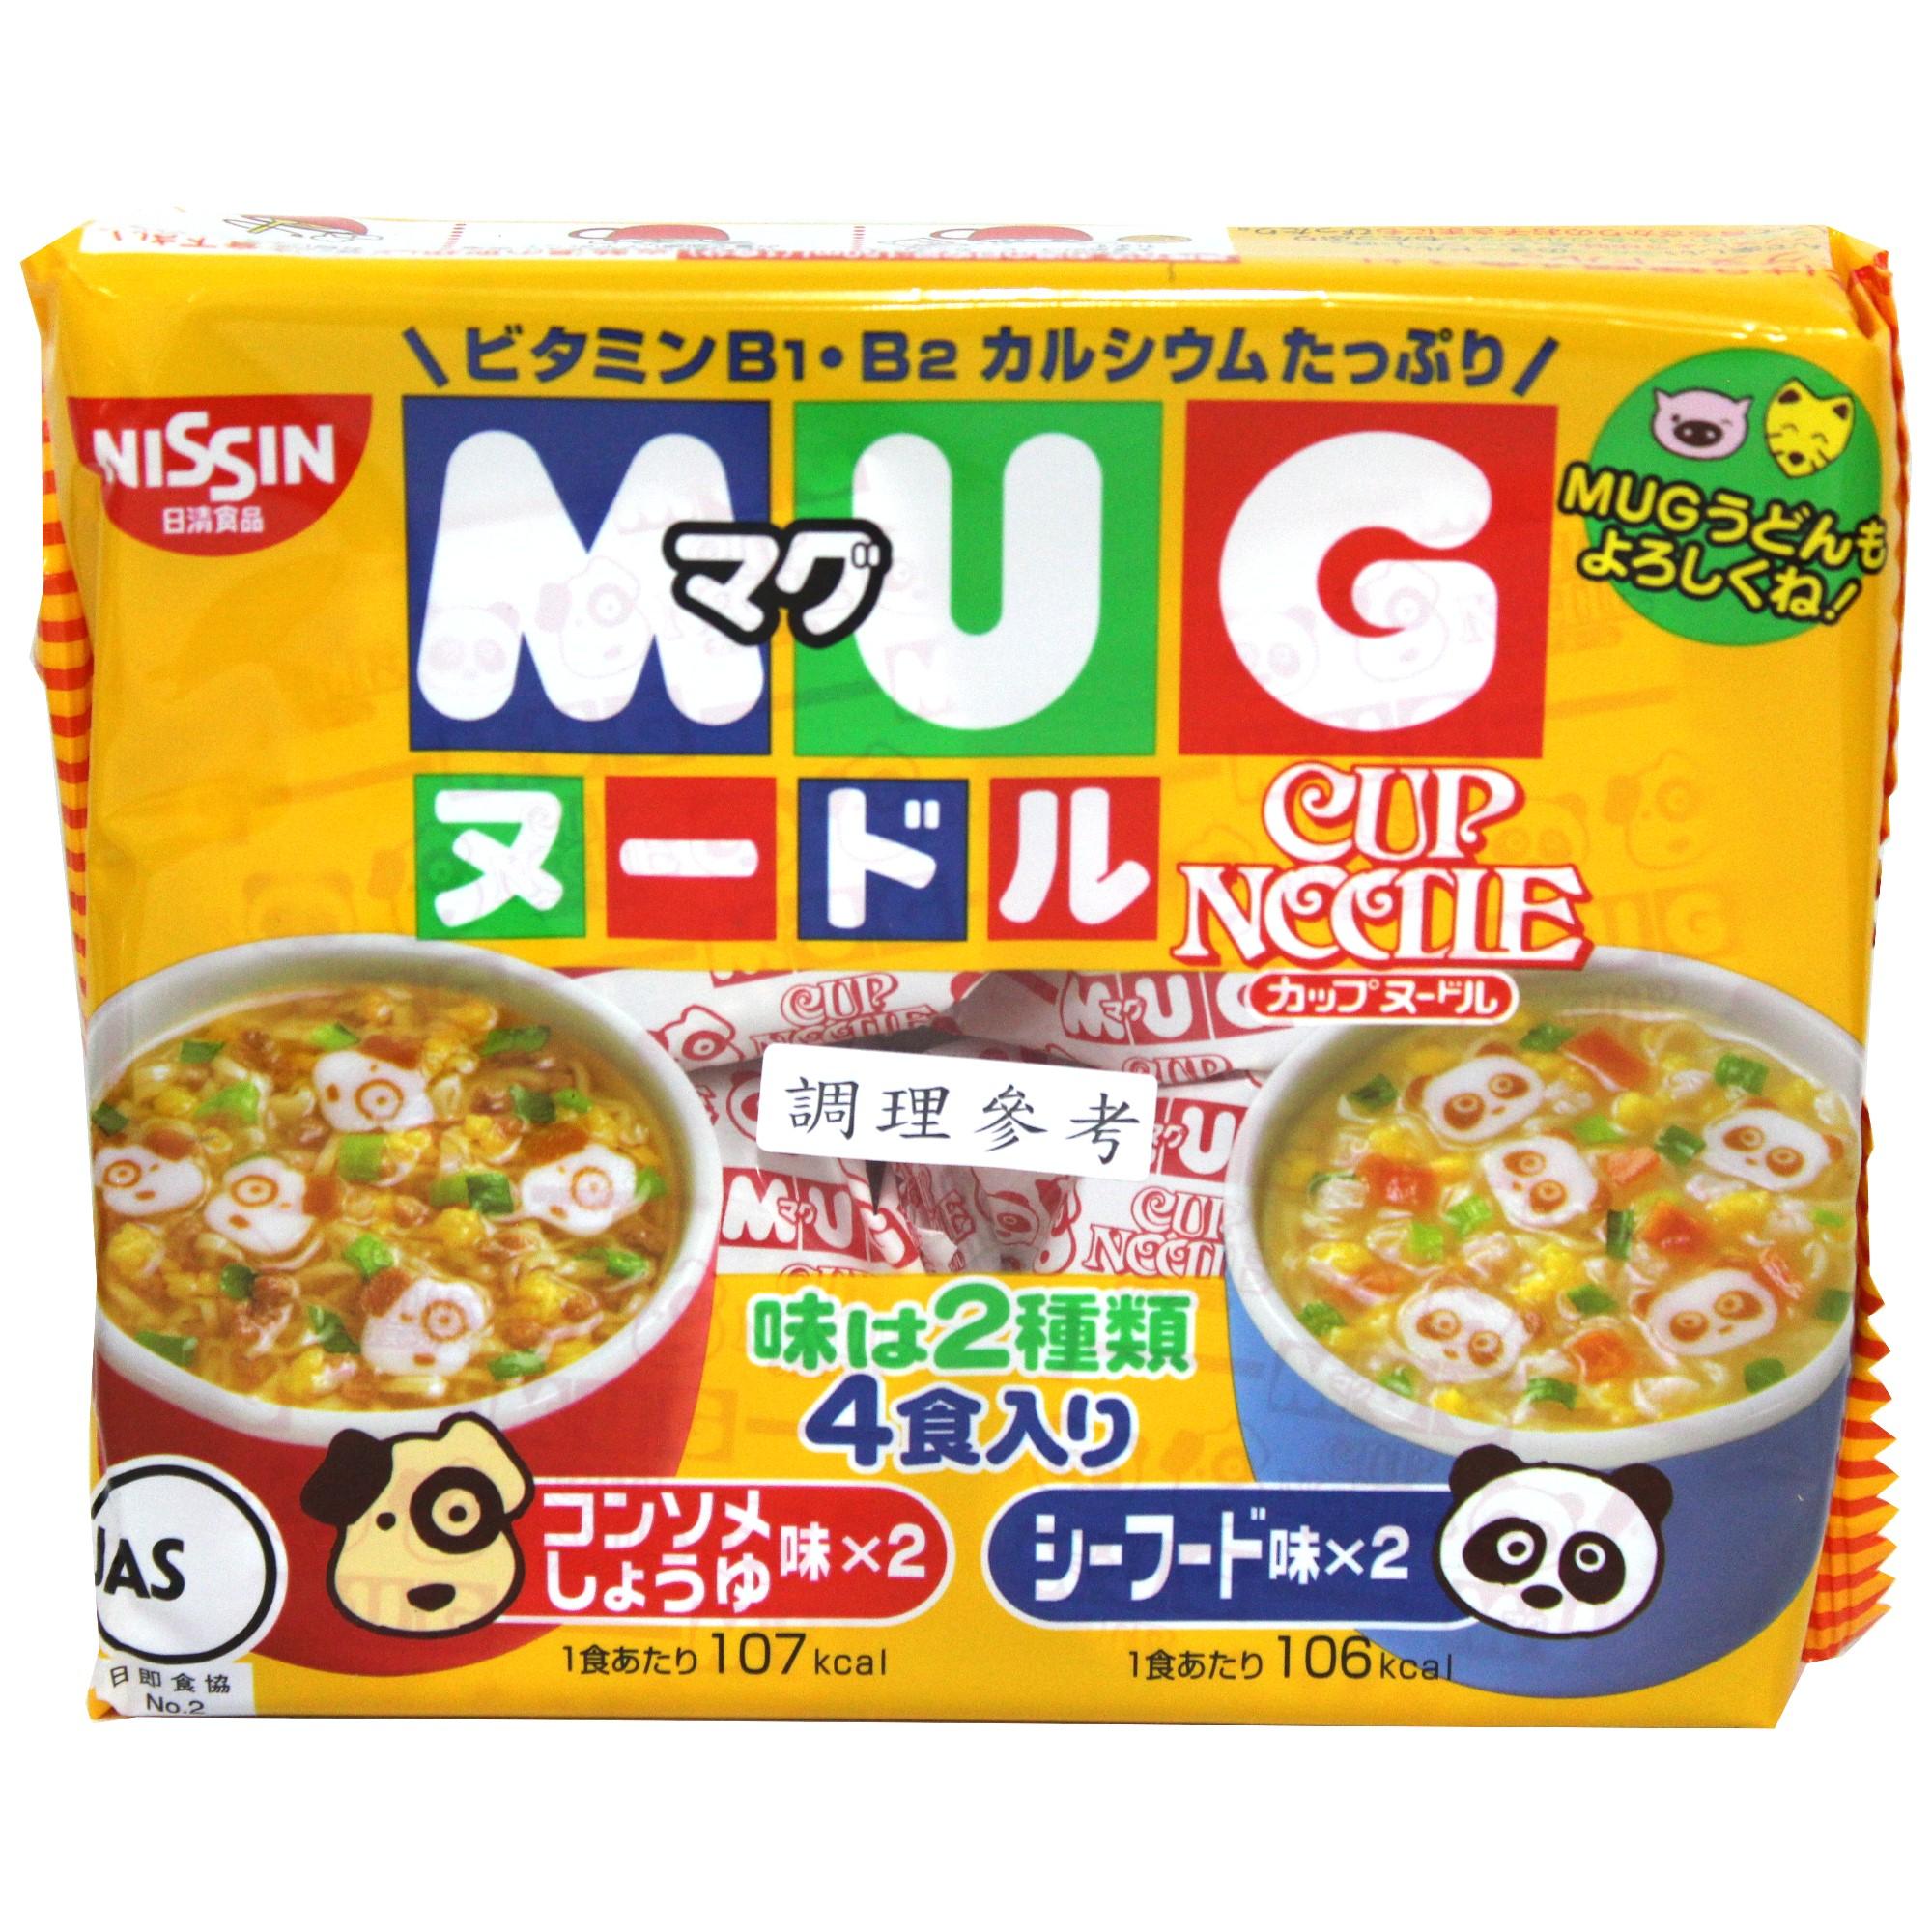 NISSIN 日清 MUG 馬克杯麵黃袋(醬油&海鮮) 94g